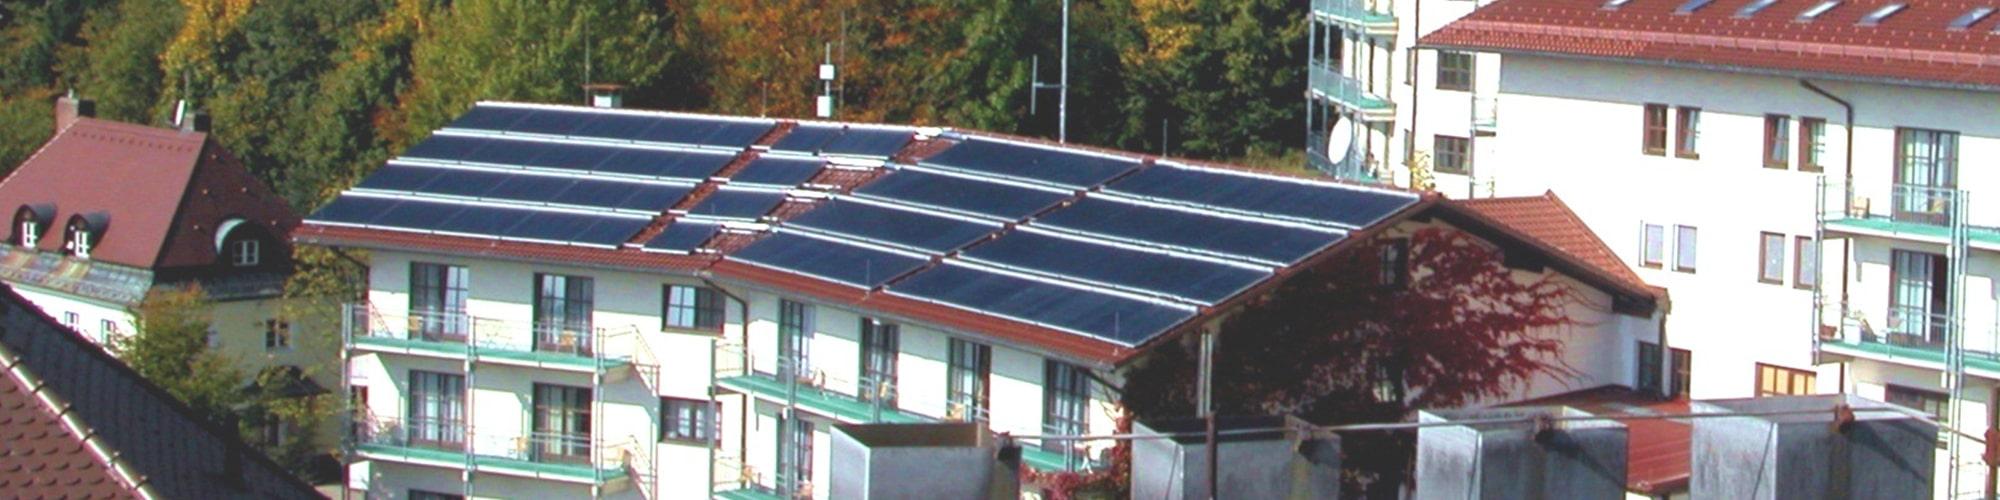 Wärmenetz mit Solar: Asklepios Klinik Schaufling